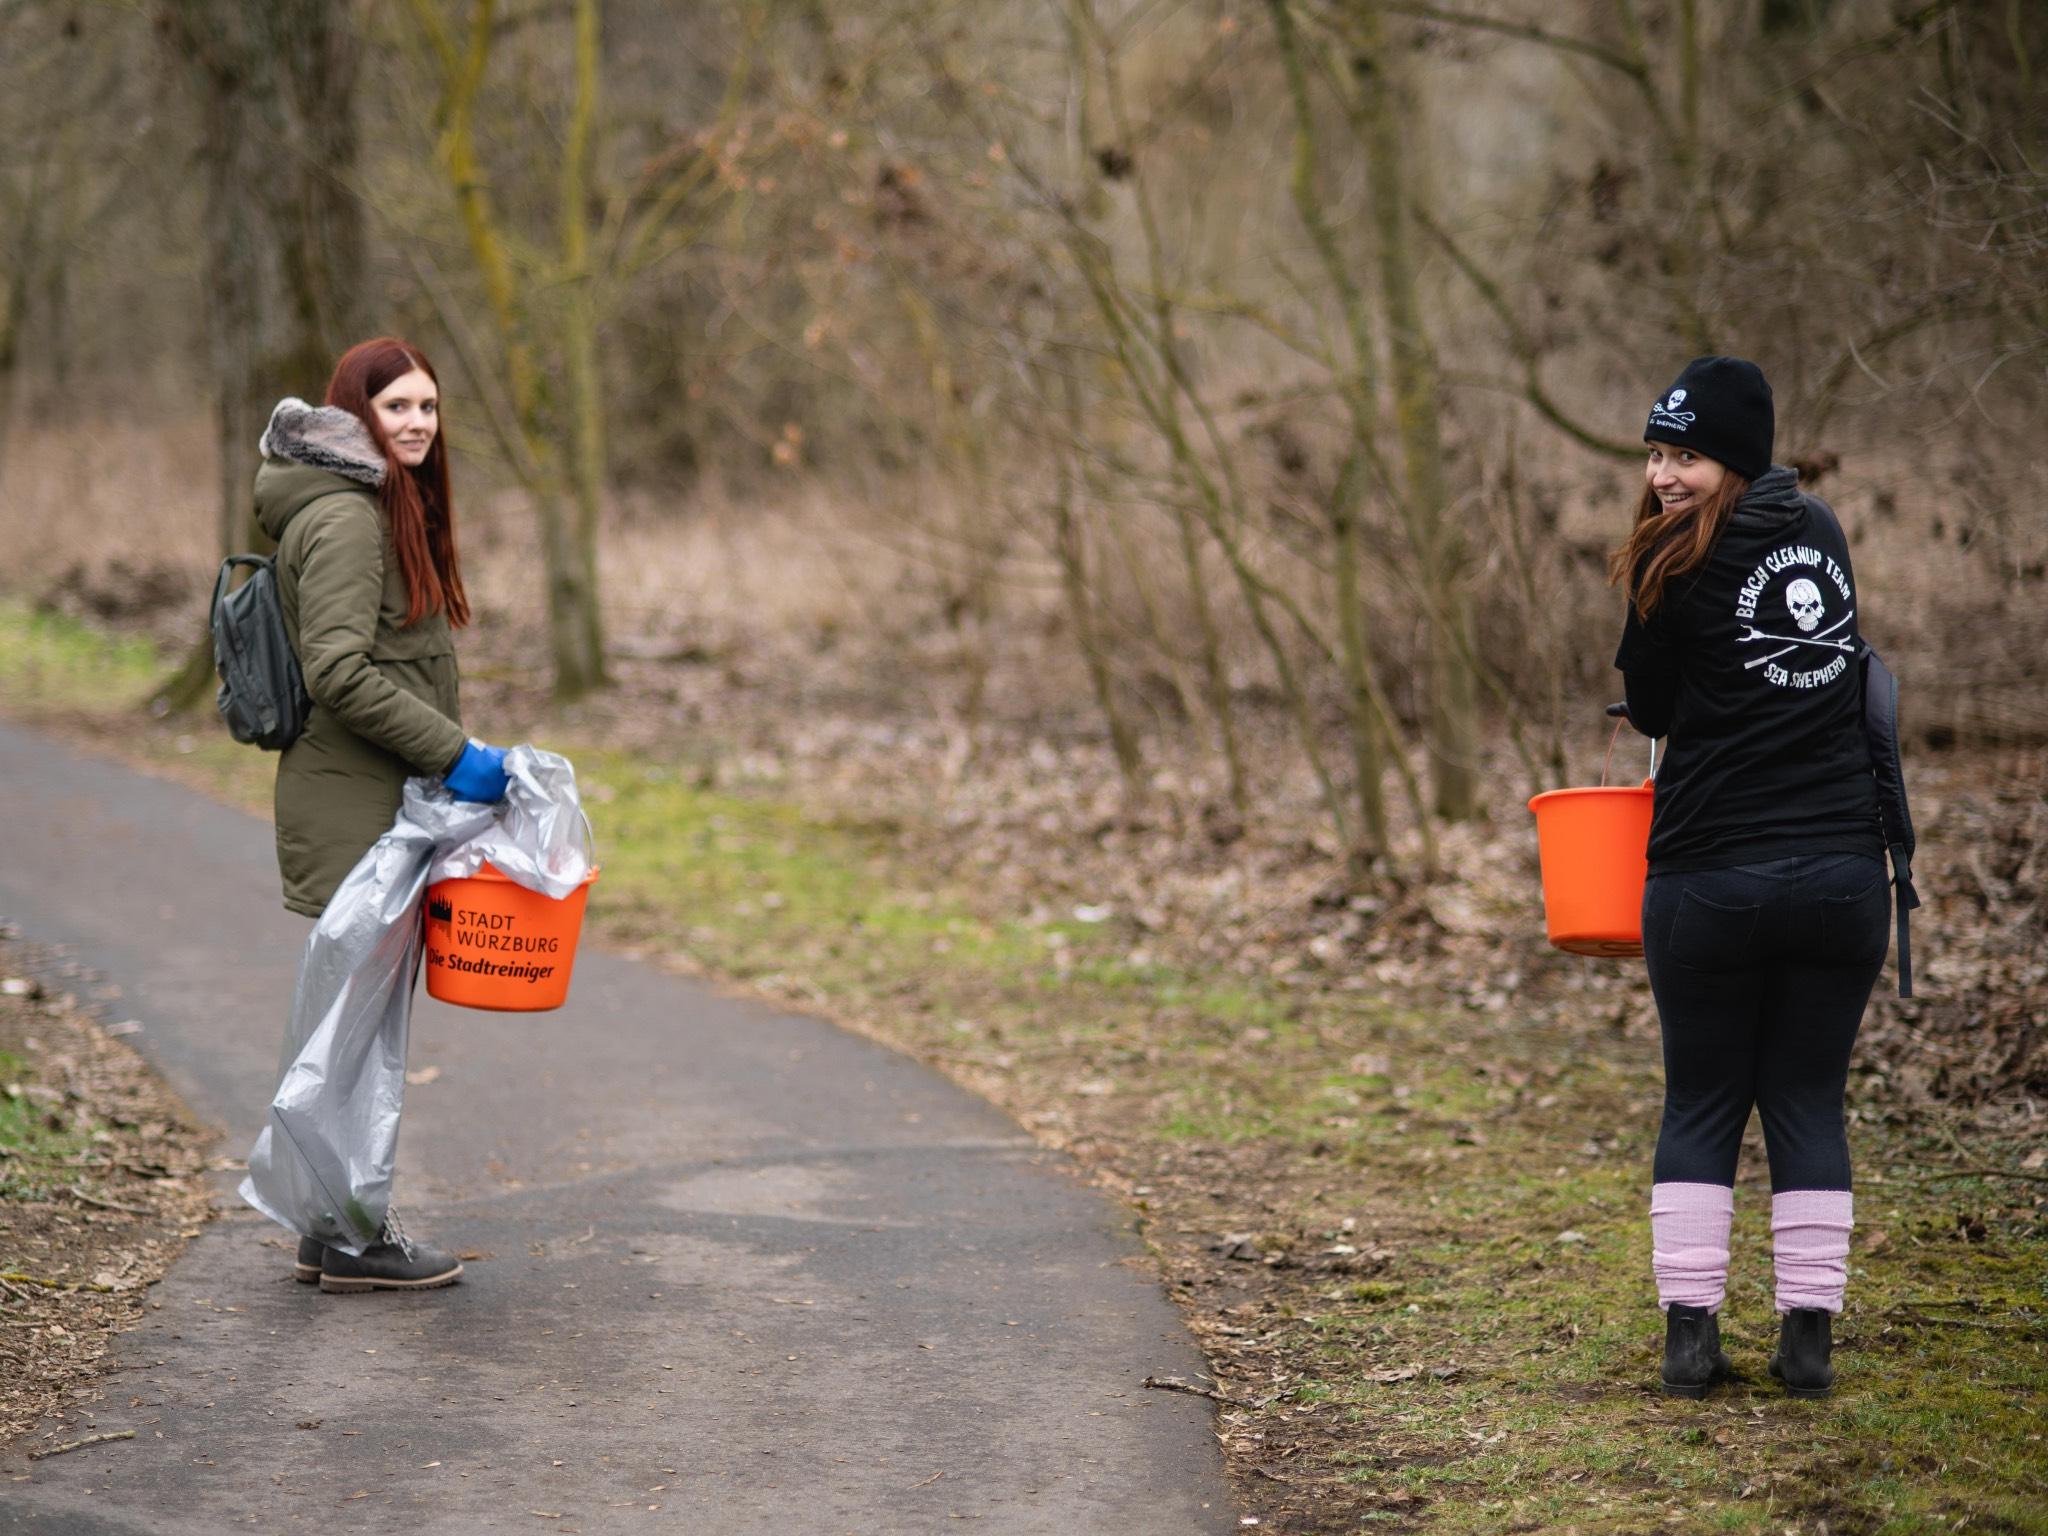 Fleißige Helfer waren unterwegs. Foto: Georg Hoos